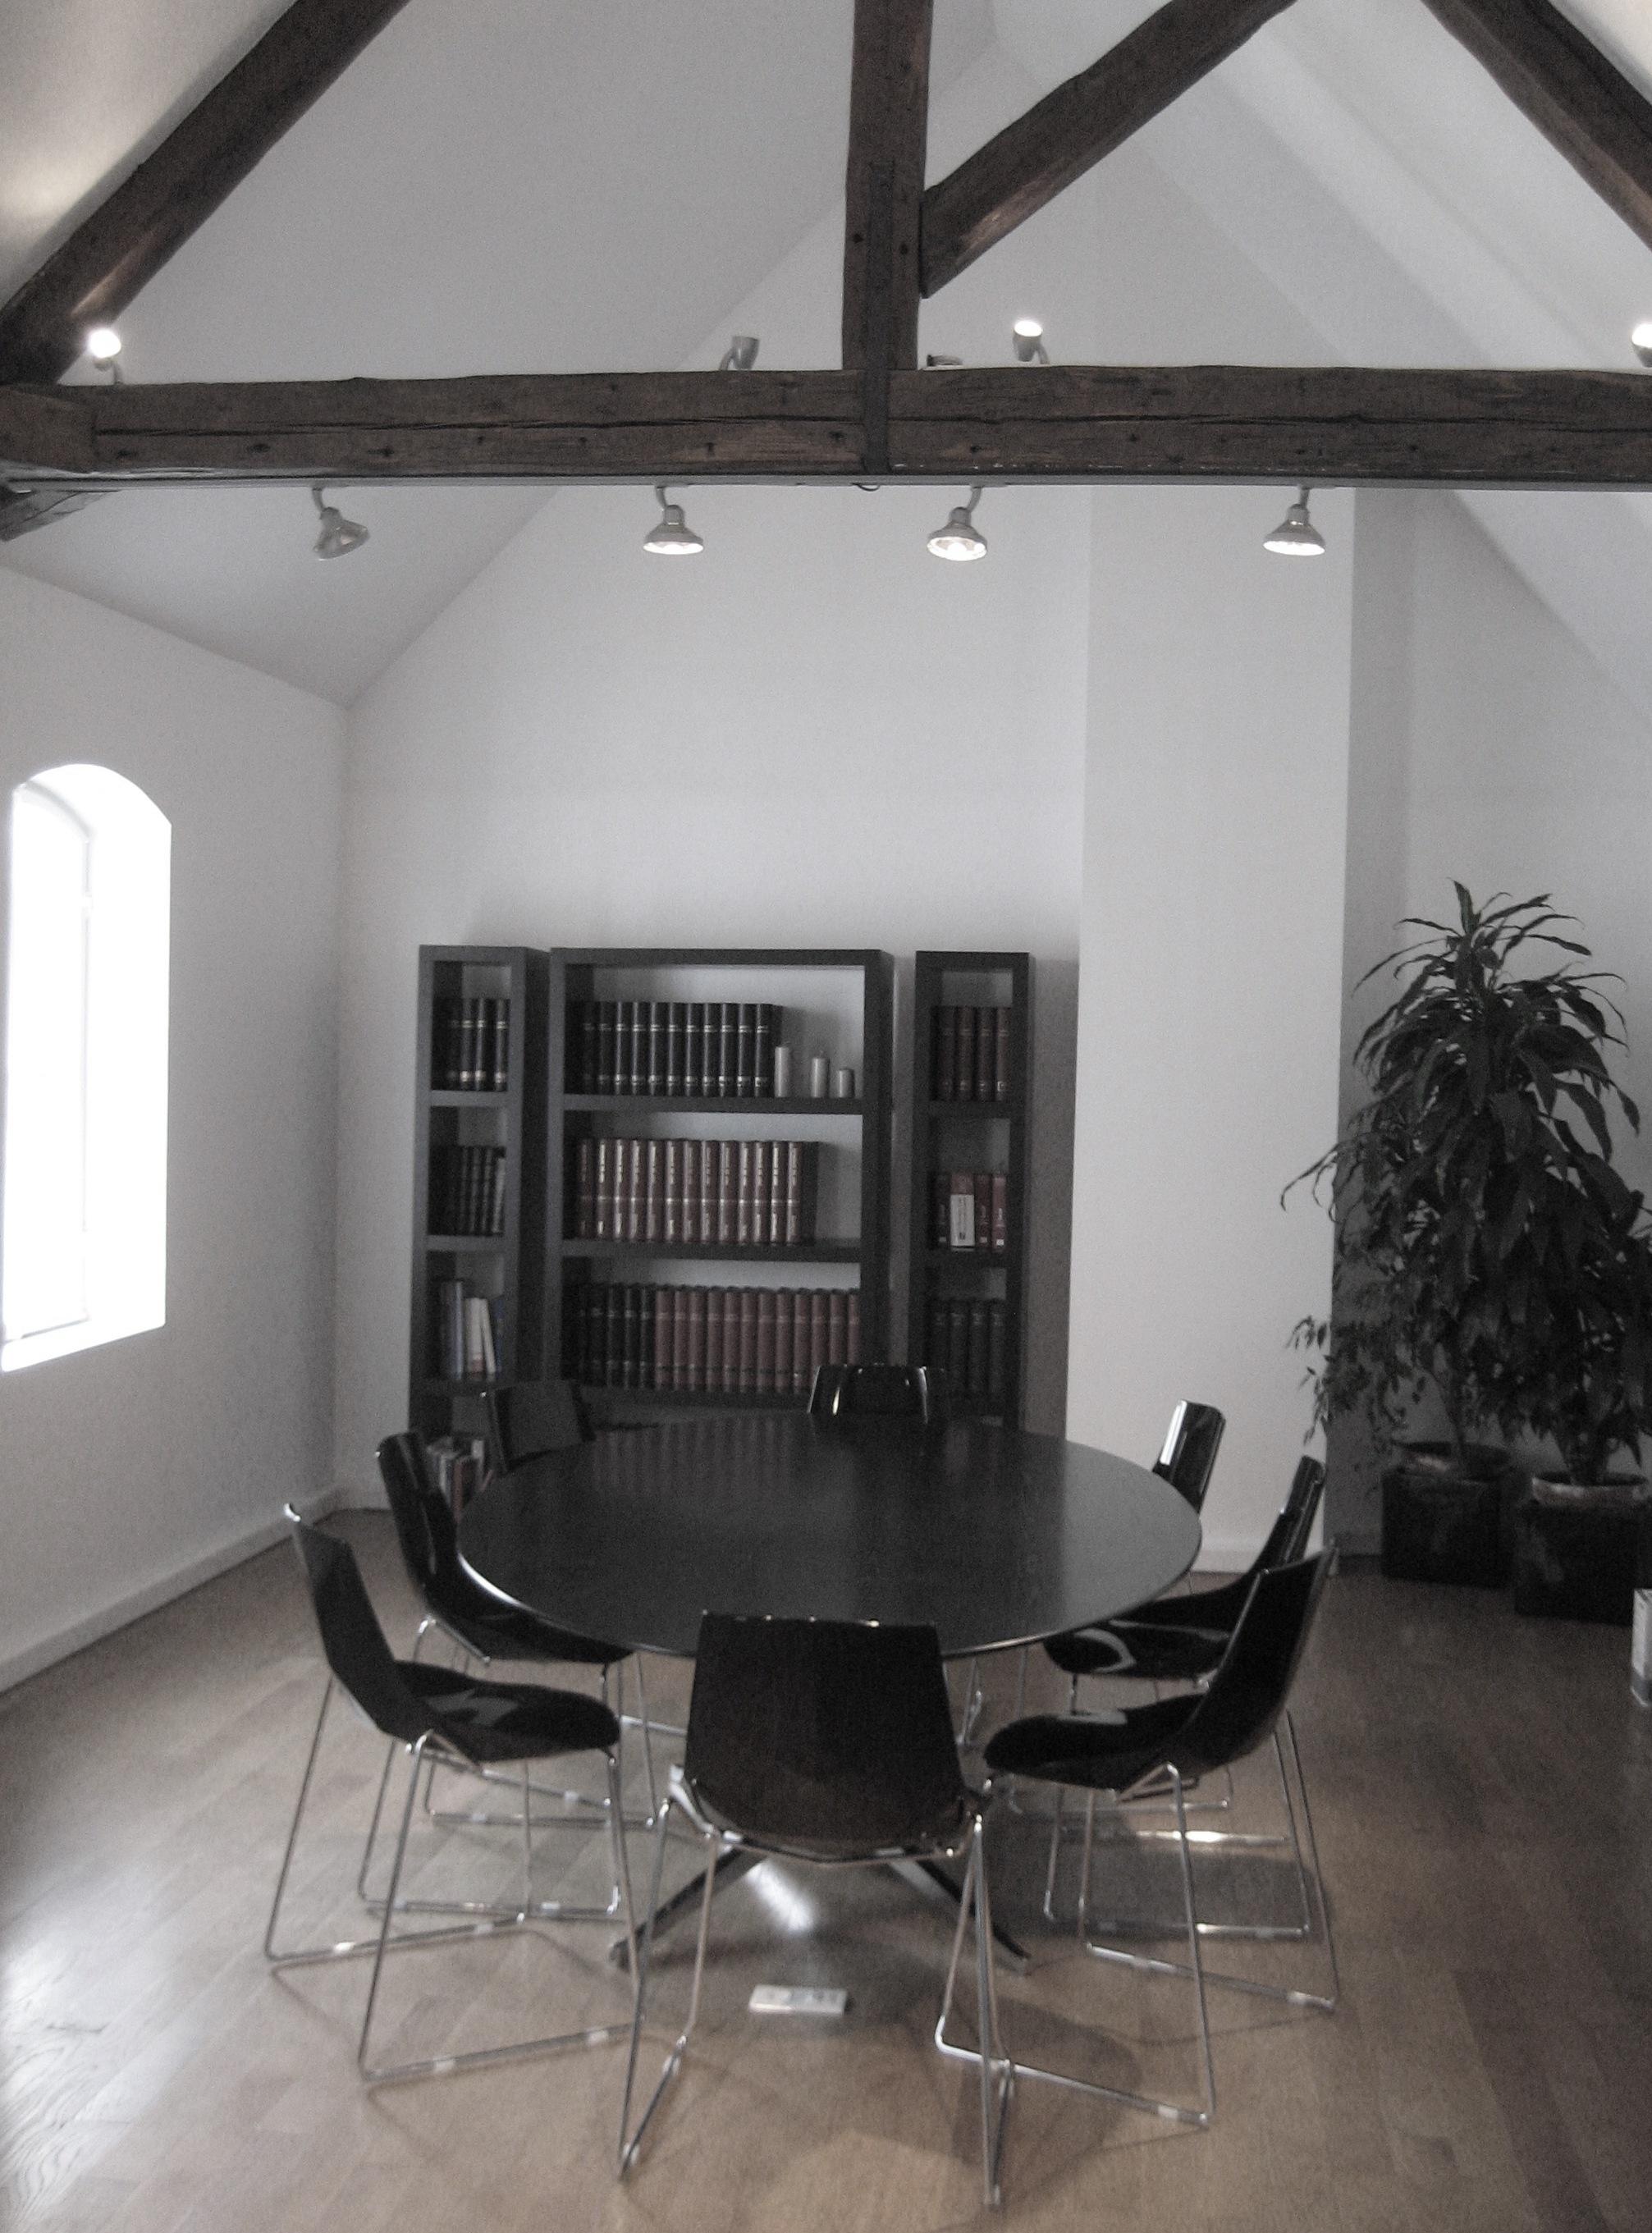 cabinet bolliet melin avocats. Black Bedroom Furniture Sets. Home Design Ideas